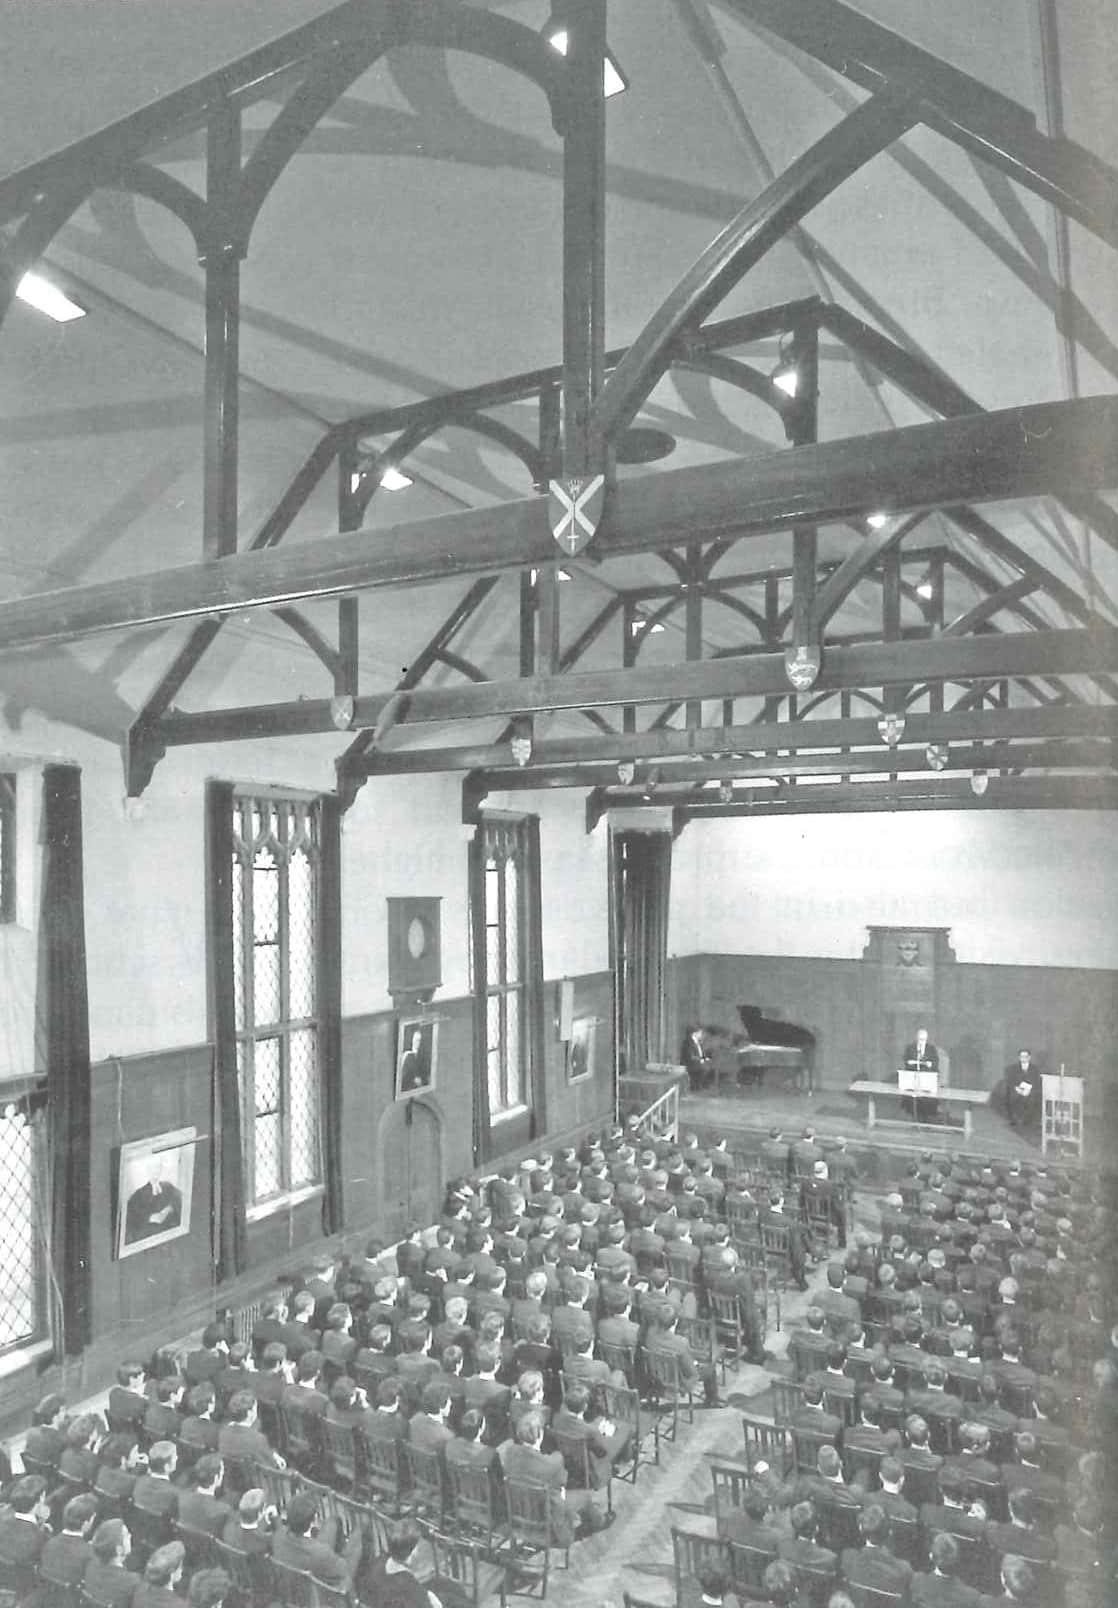 School assembly, 1969